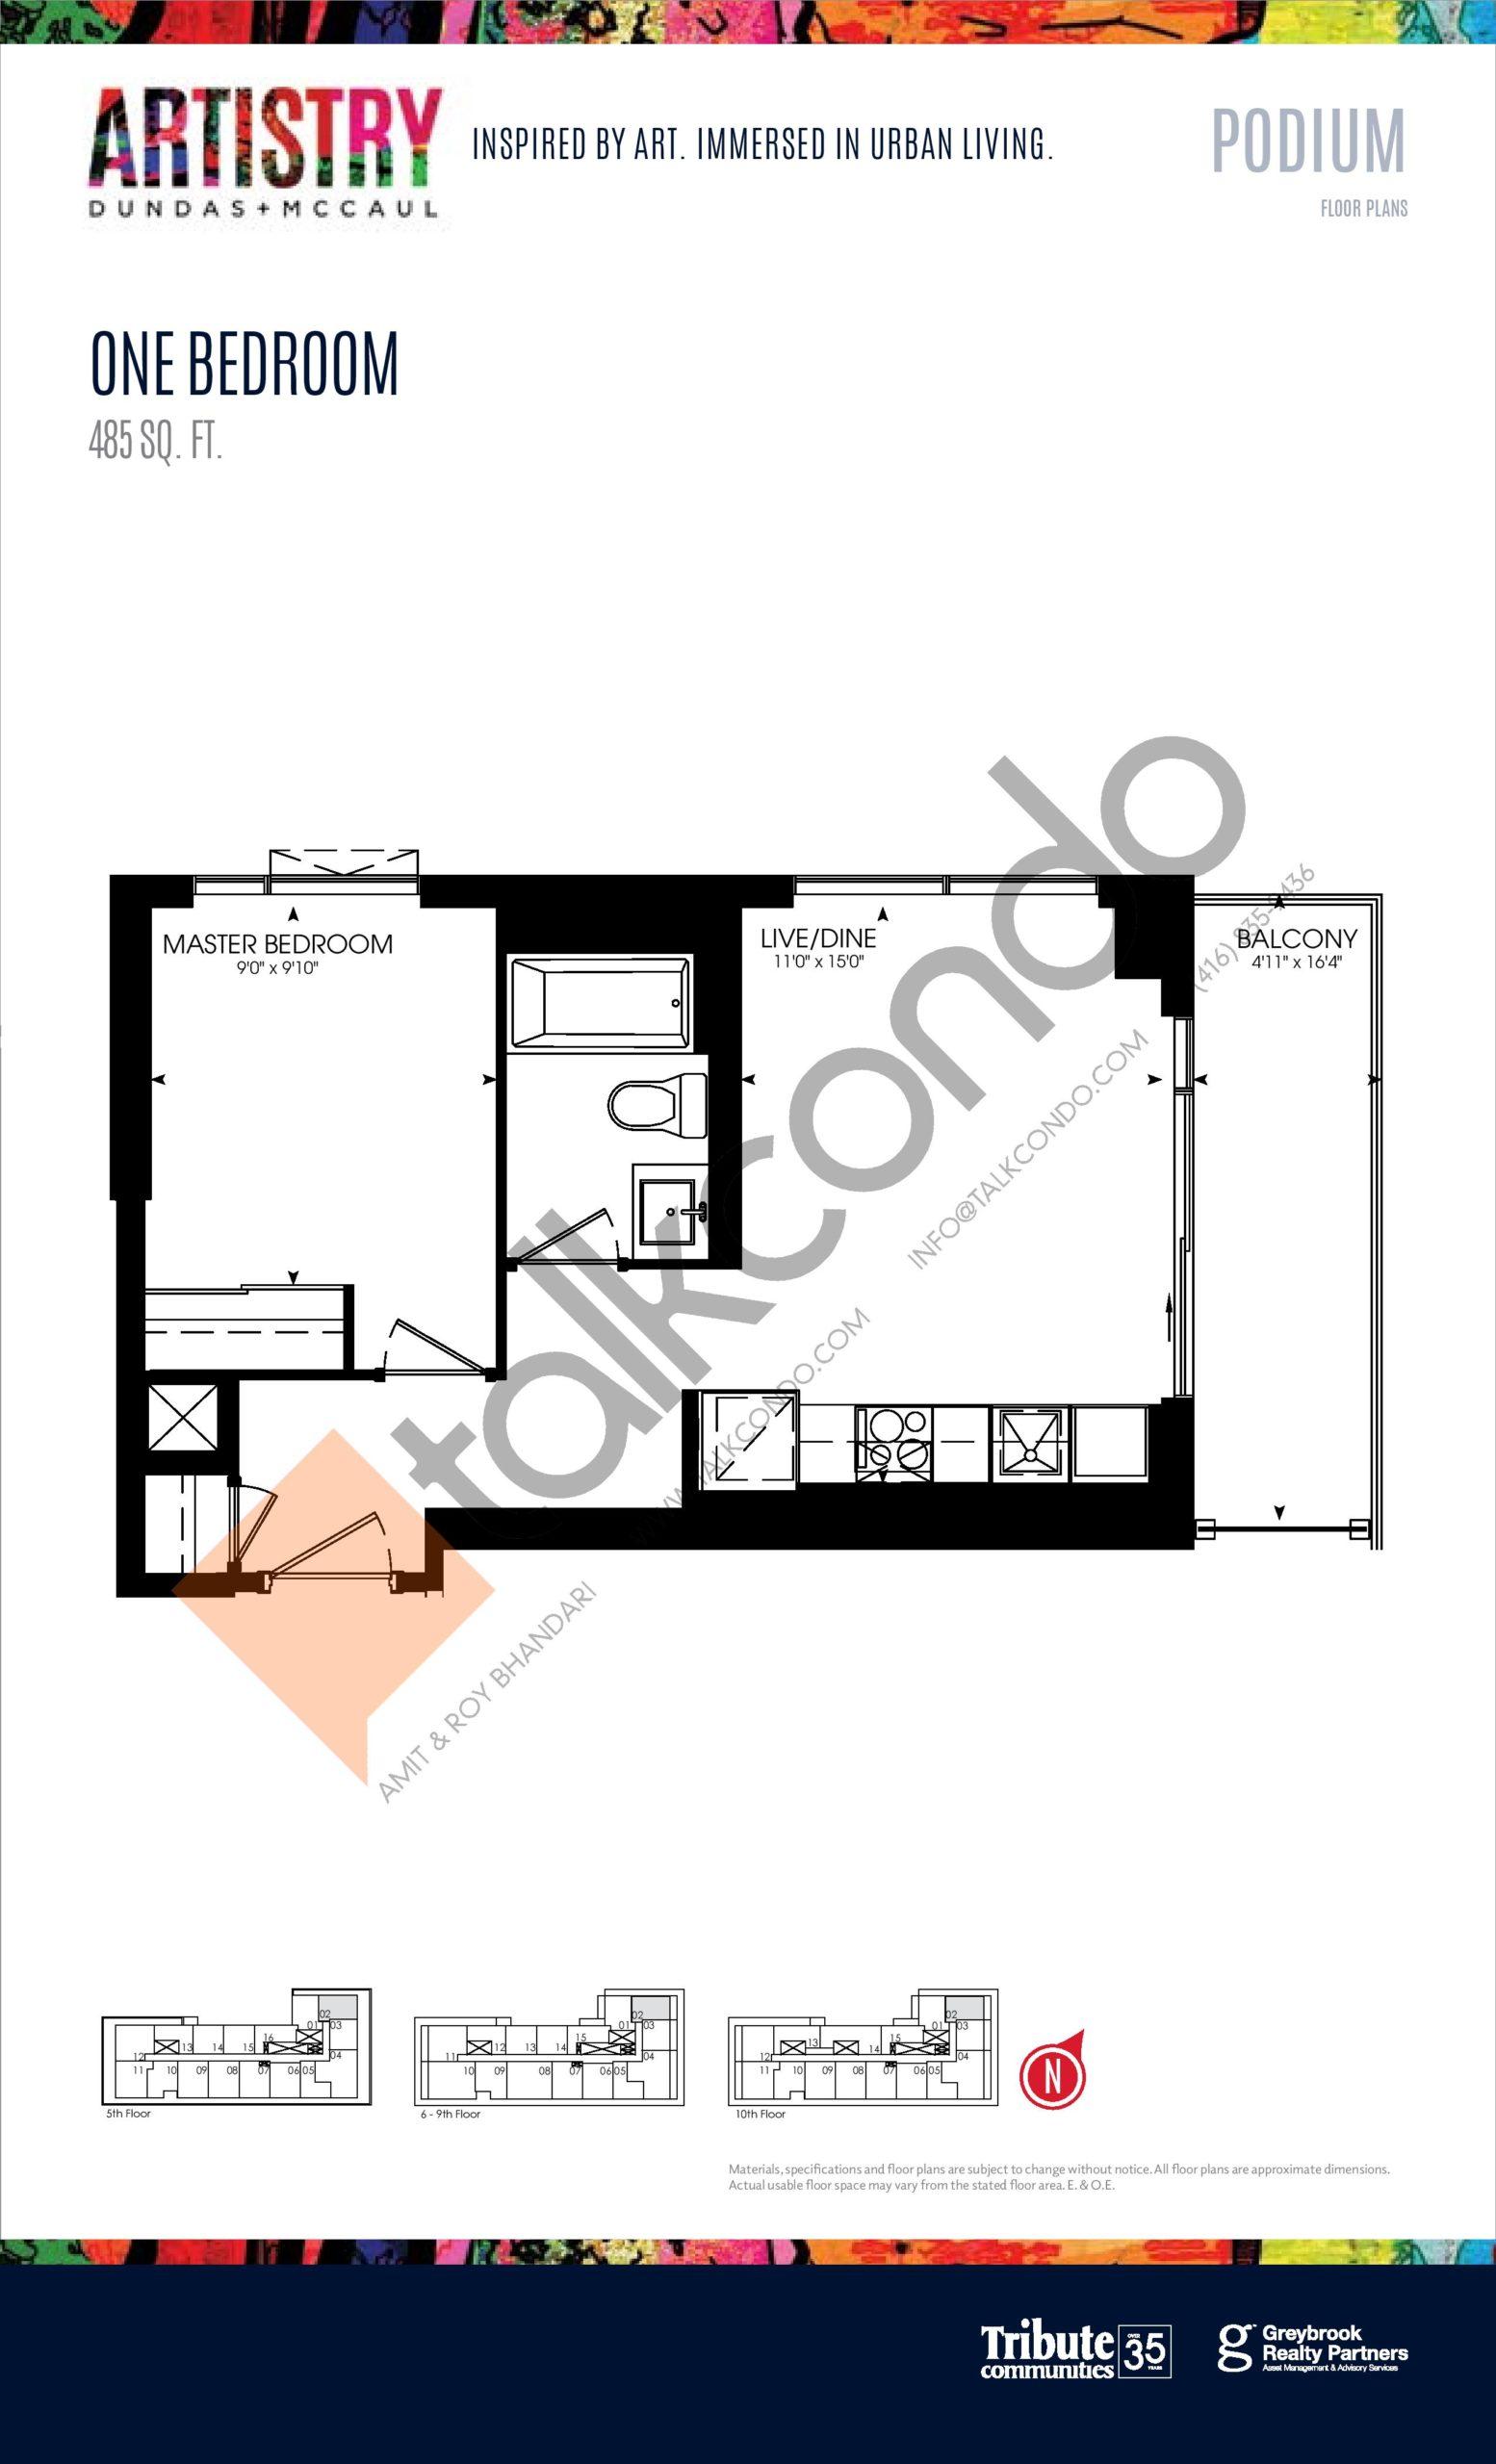 485 sq. ft. - Podium Floor Plan at Artistry Condos - 485 sq.ft